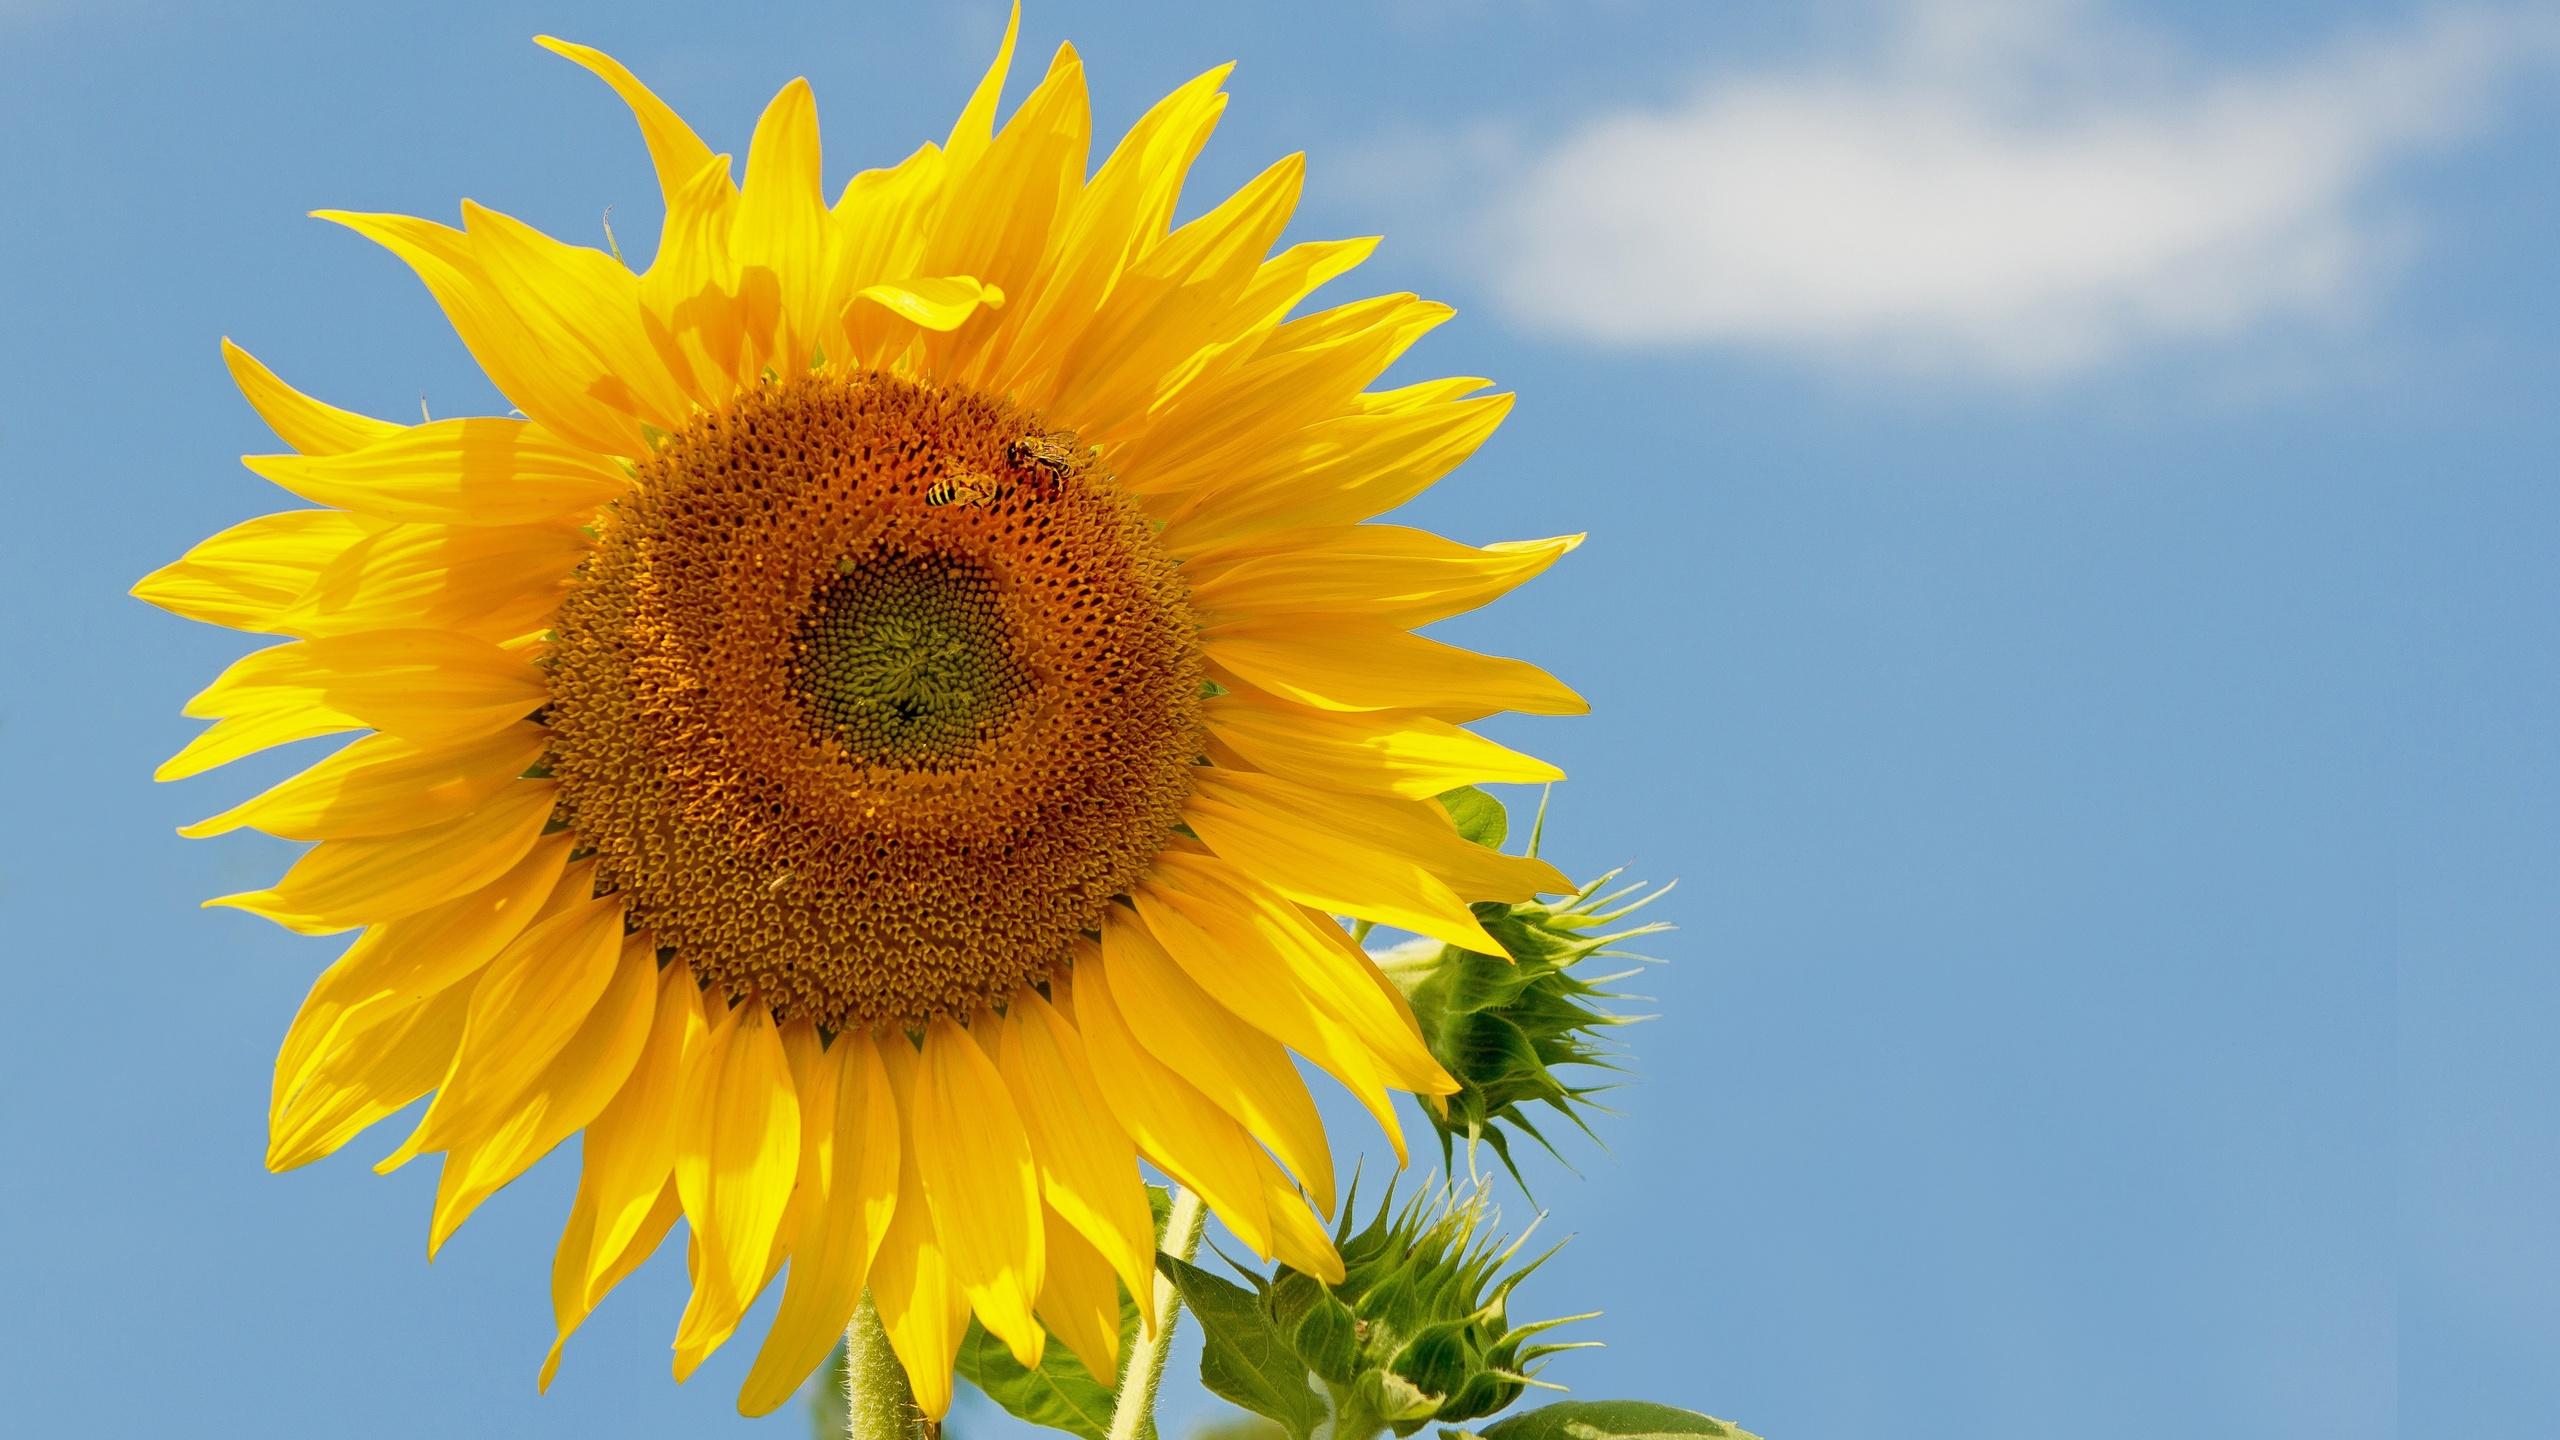 подсолнух, небо, пчёлы